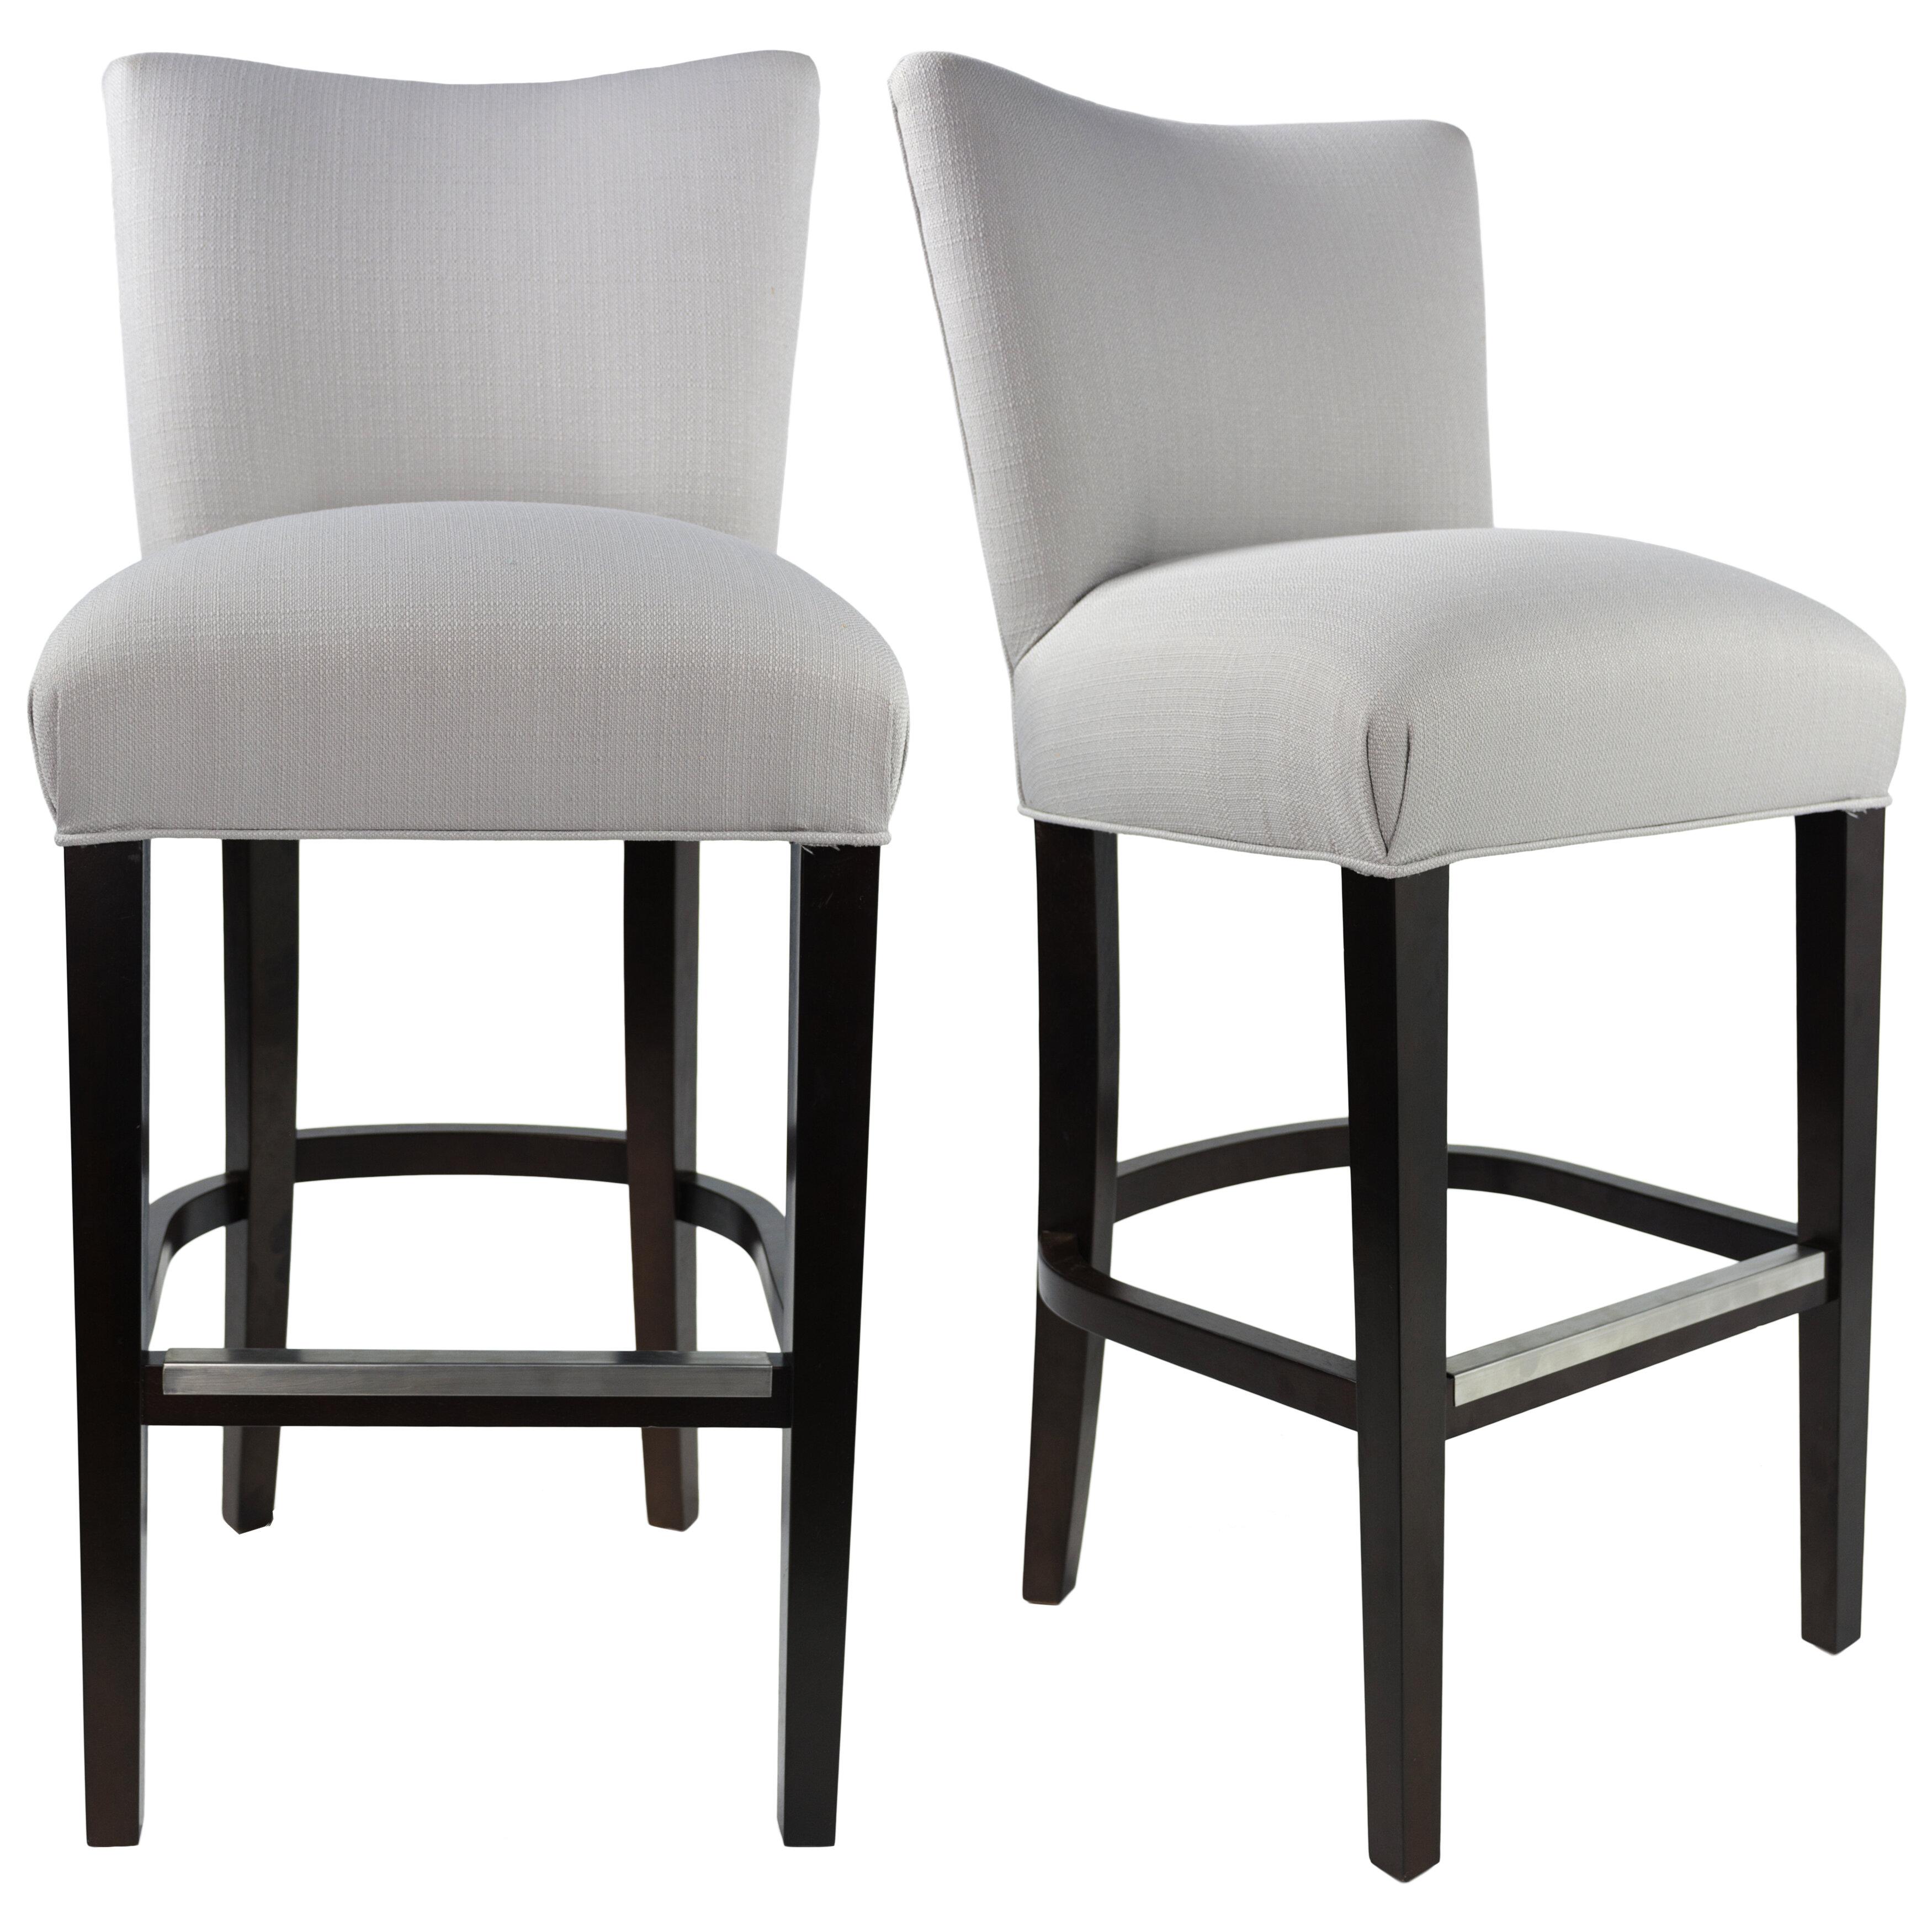 Red barrel studio pax 31 upholstered bar stool wayfair